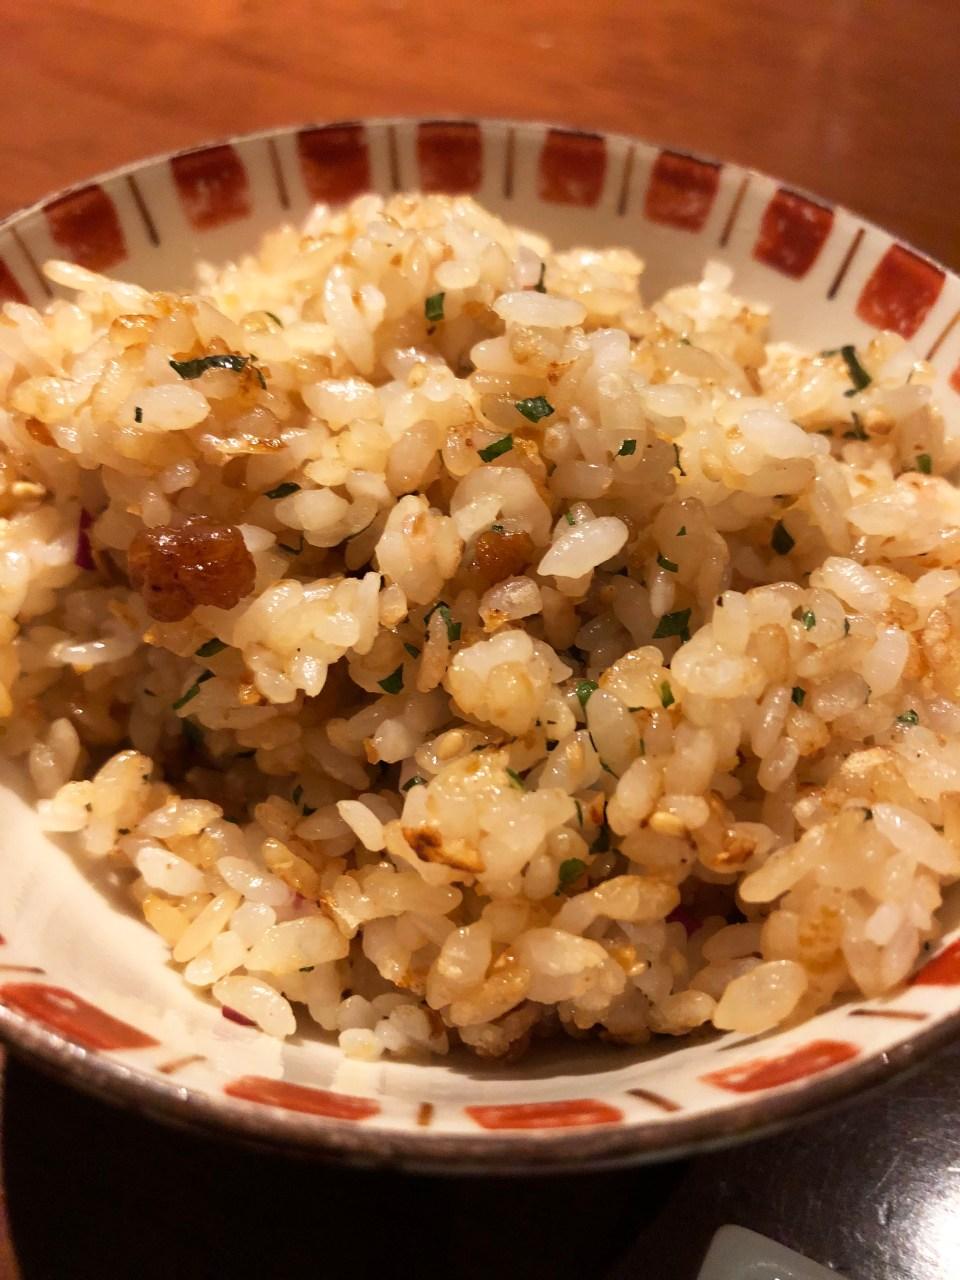 Junisoh - Garlic Fried Rice